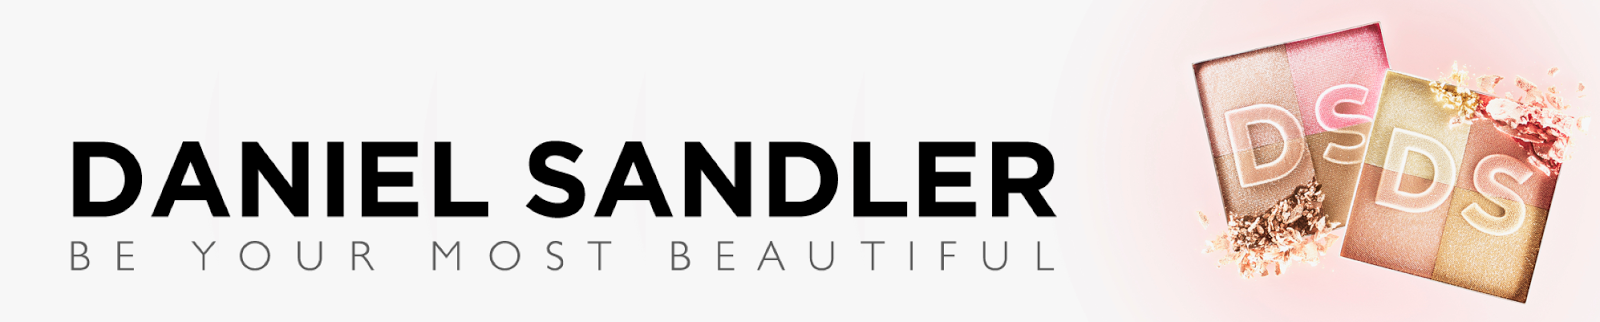 https://www.danielsandler.com/